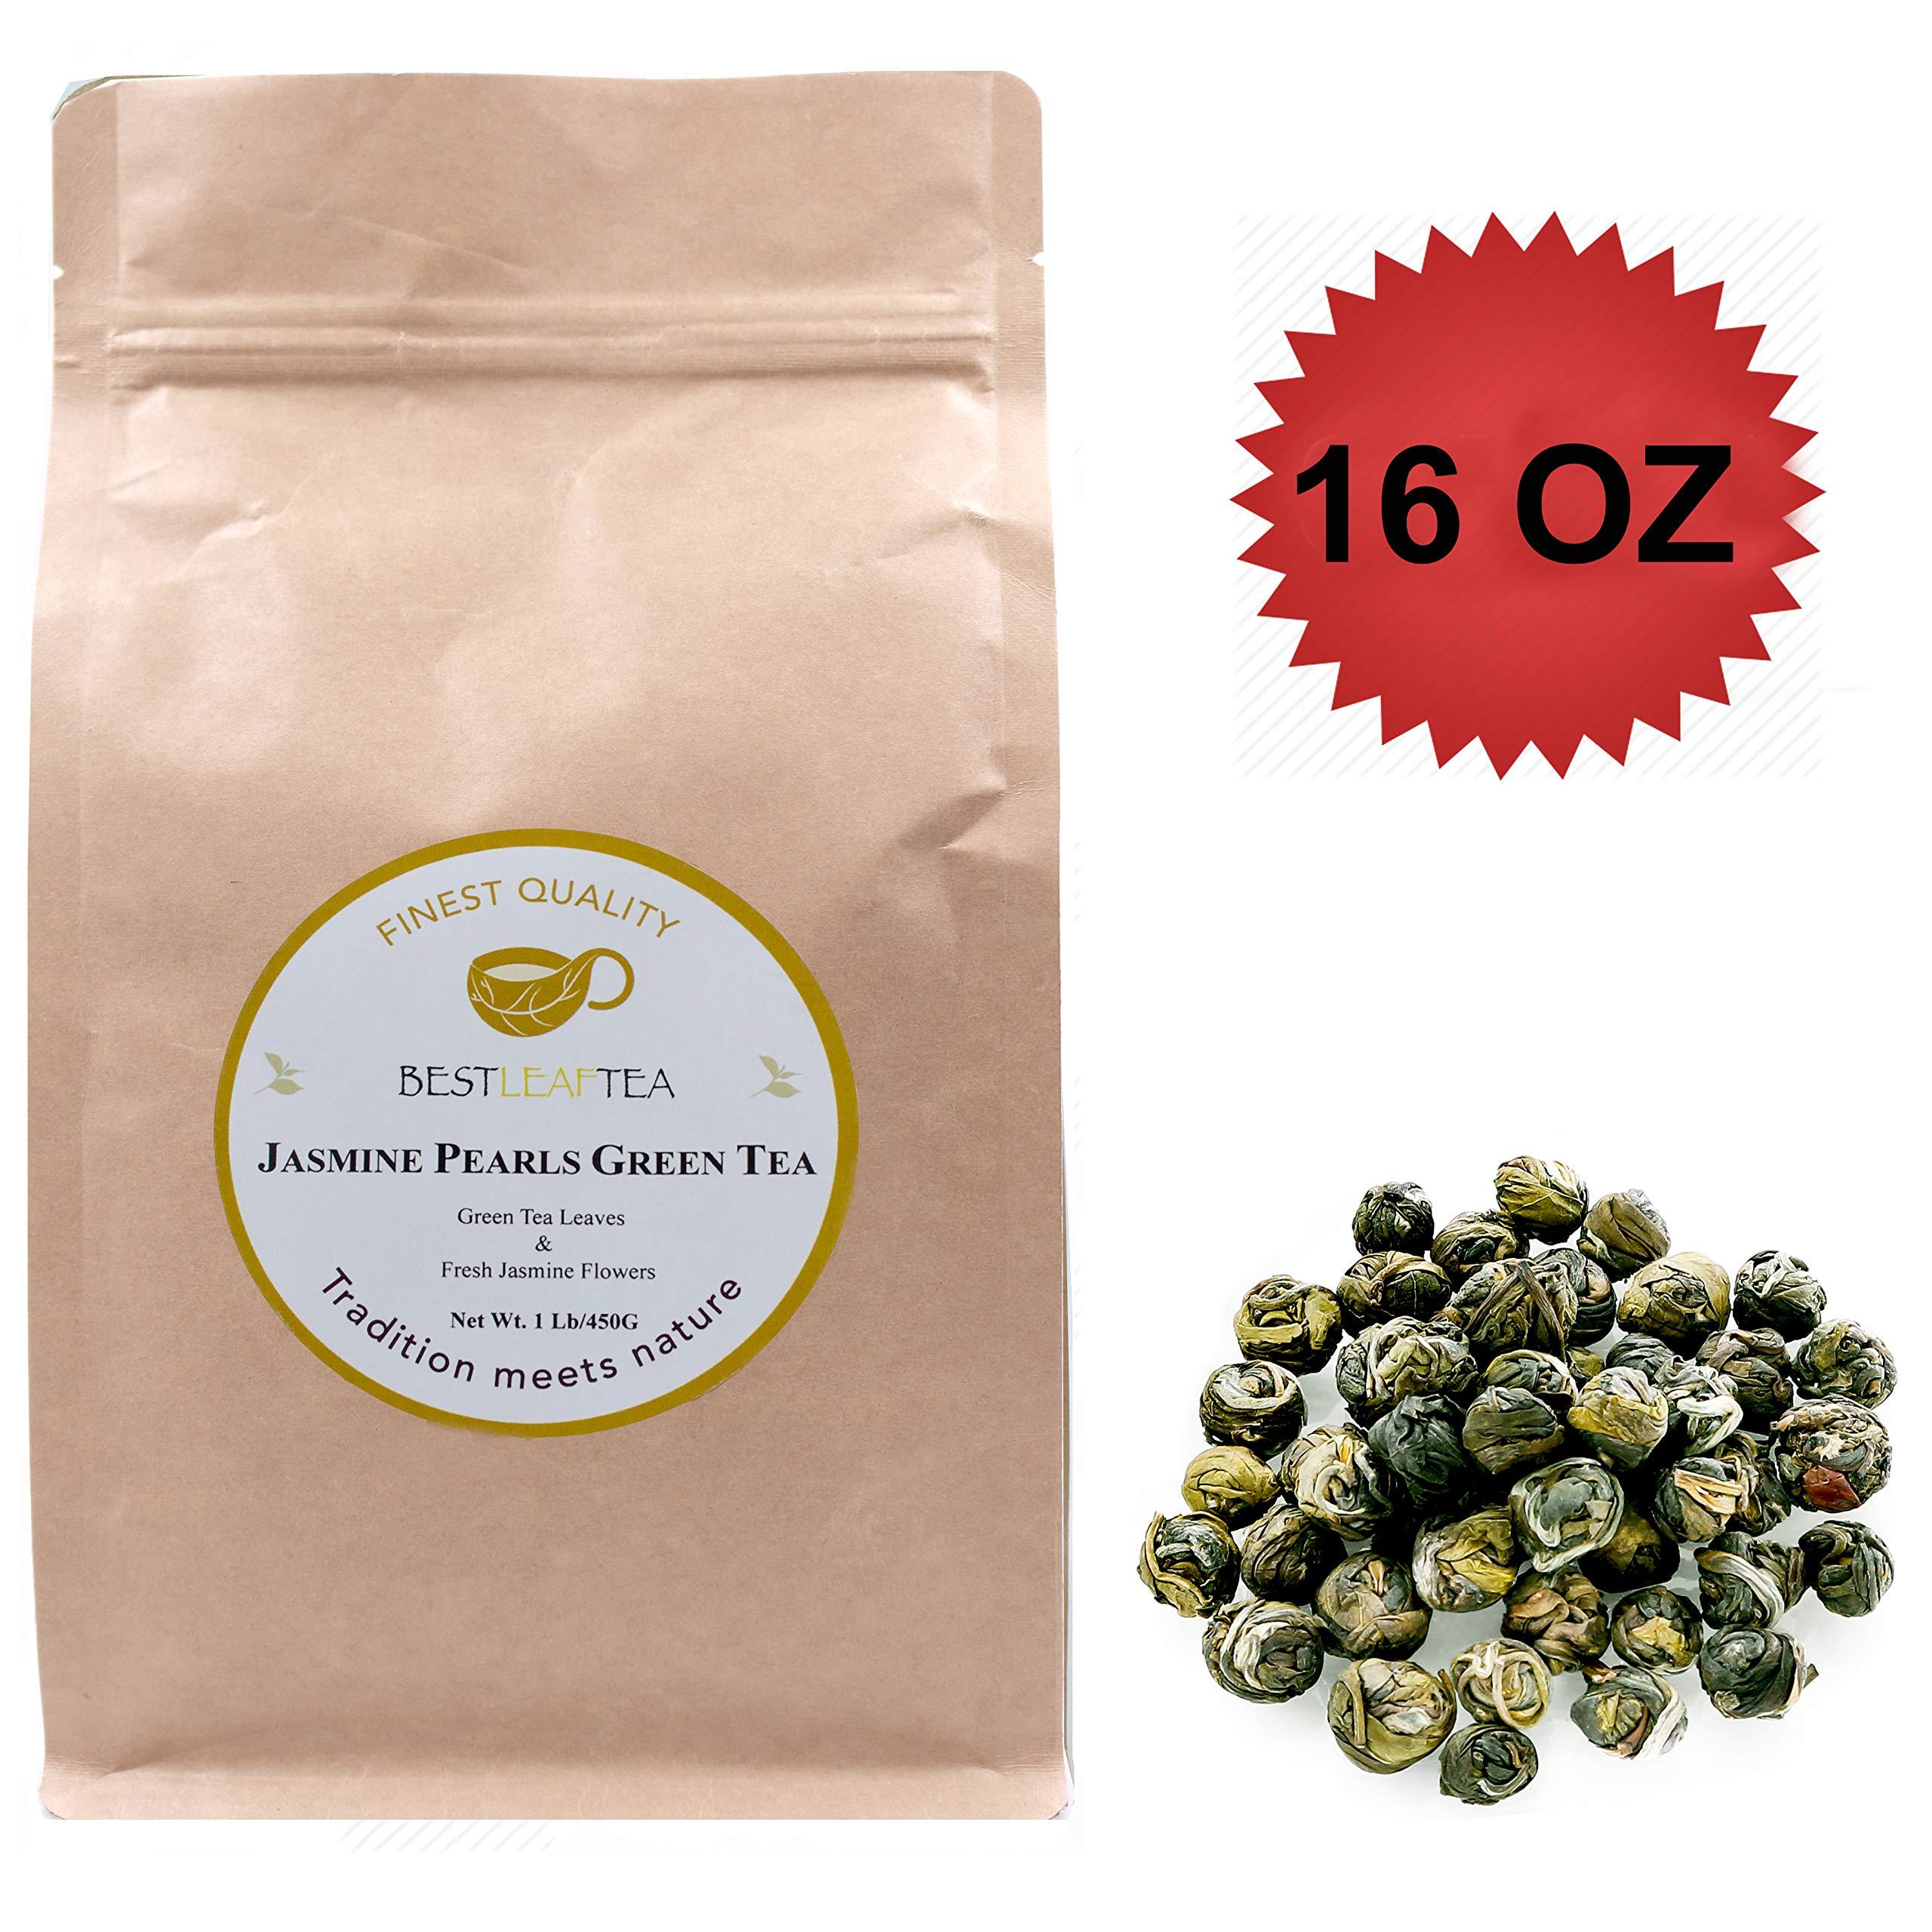 BESTLEAFTEA- 2019 New Jasmine Pearls Green Tea/Dragon Pearls Green Tea 16oz/450g